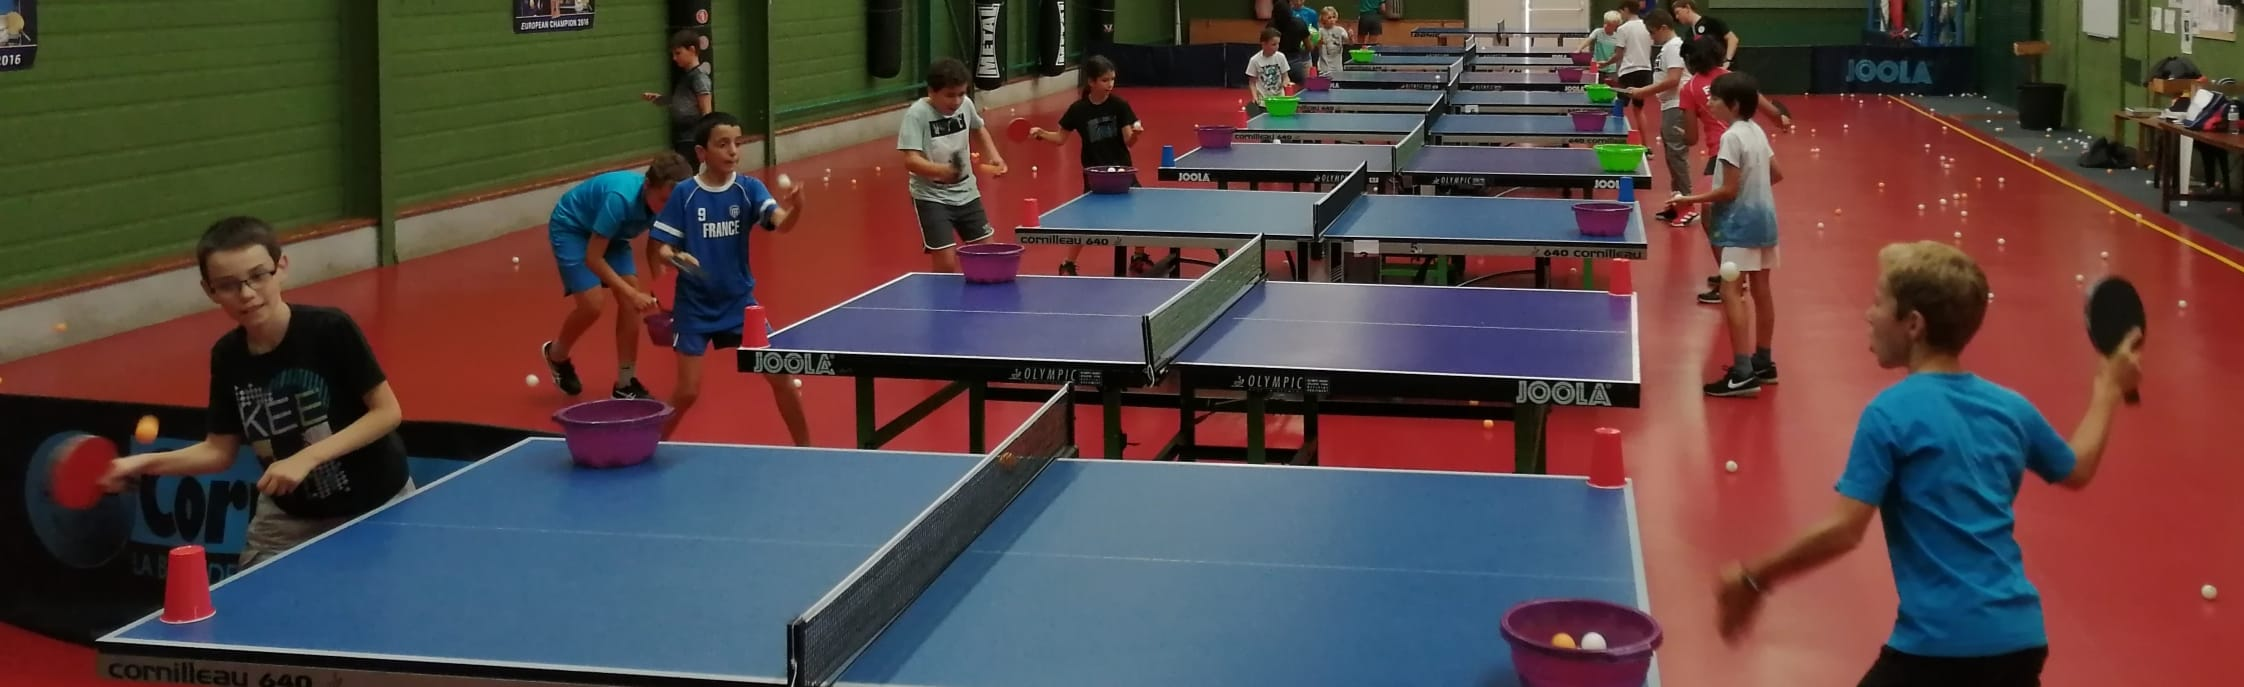 Biscarrosse Olympique                                                                                                                                                         Tennis de Table